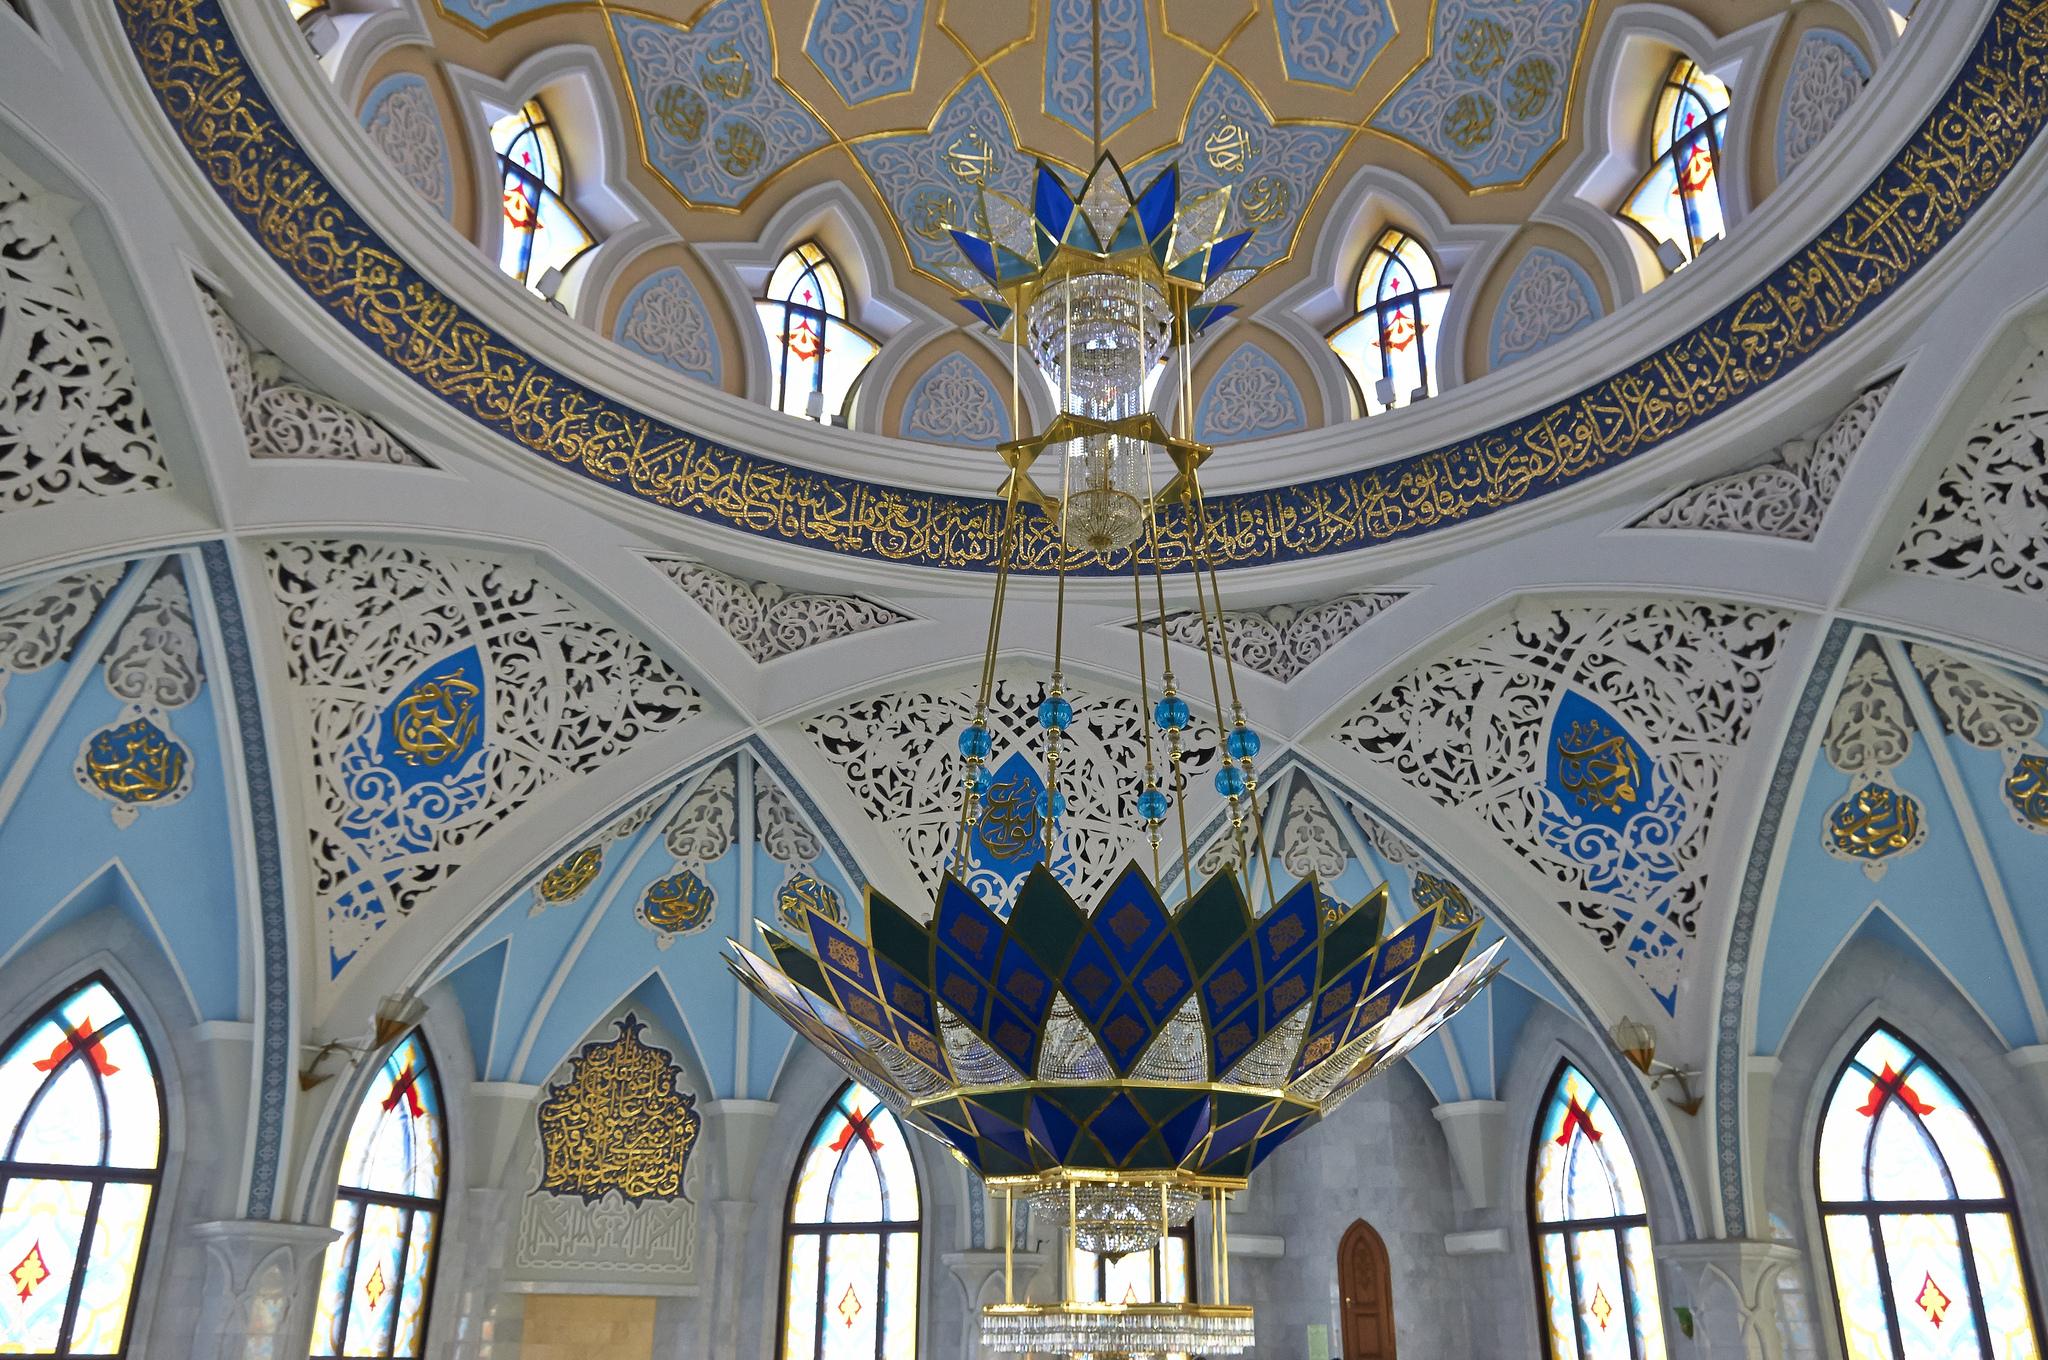 Внутри мечети, Кул-Шариф, Казань